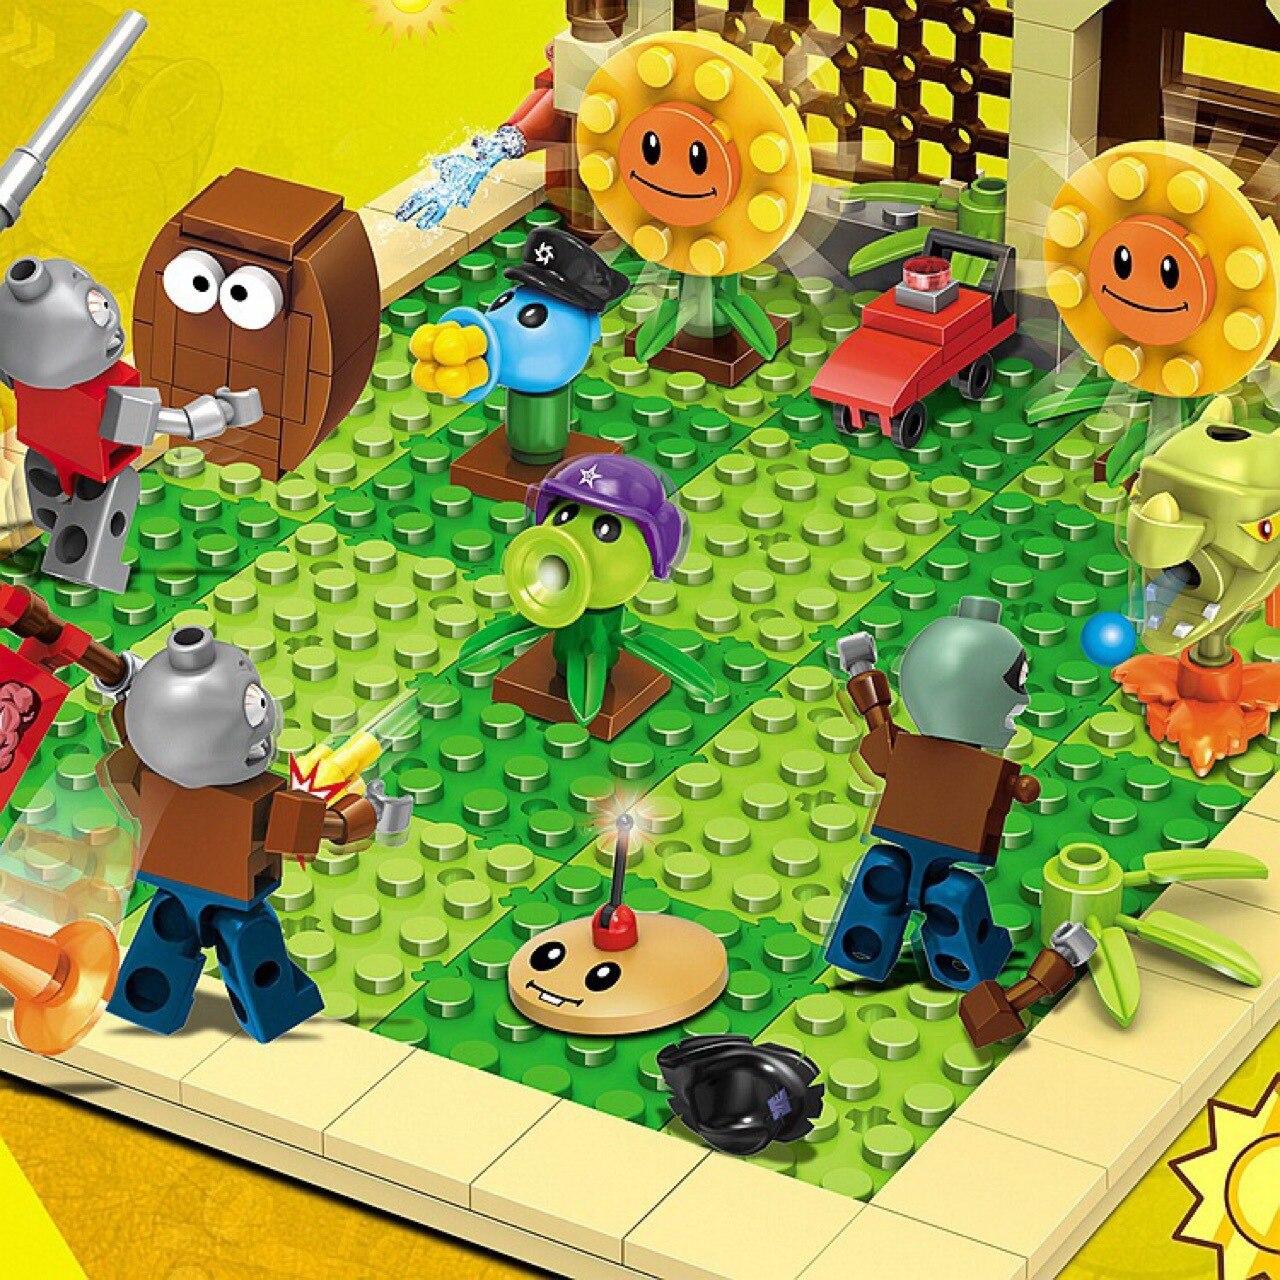 Купить с кэшбэком 2 style plants vs zombies can shoot struck game action toys & figures Building Blocks Bricks Compatible gifts